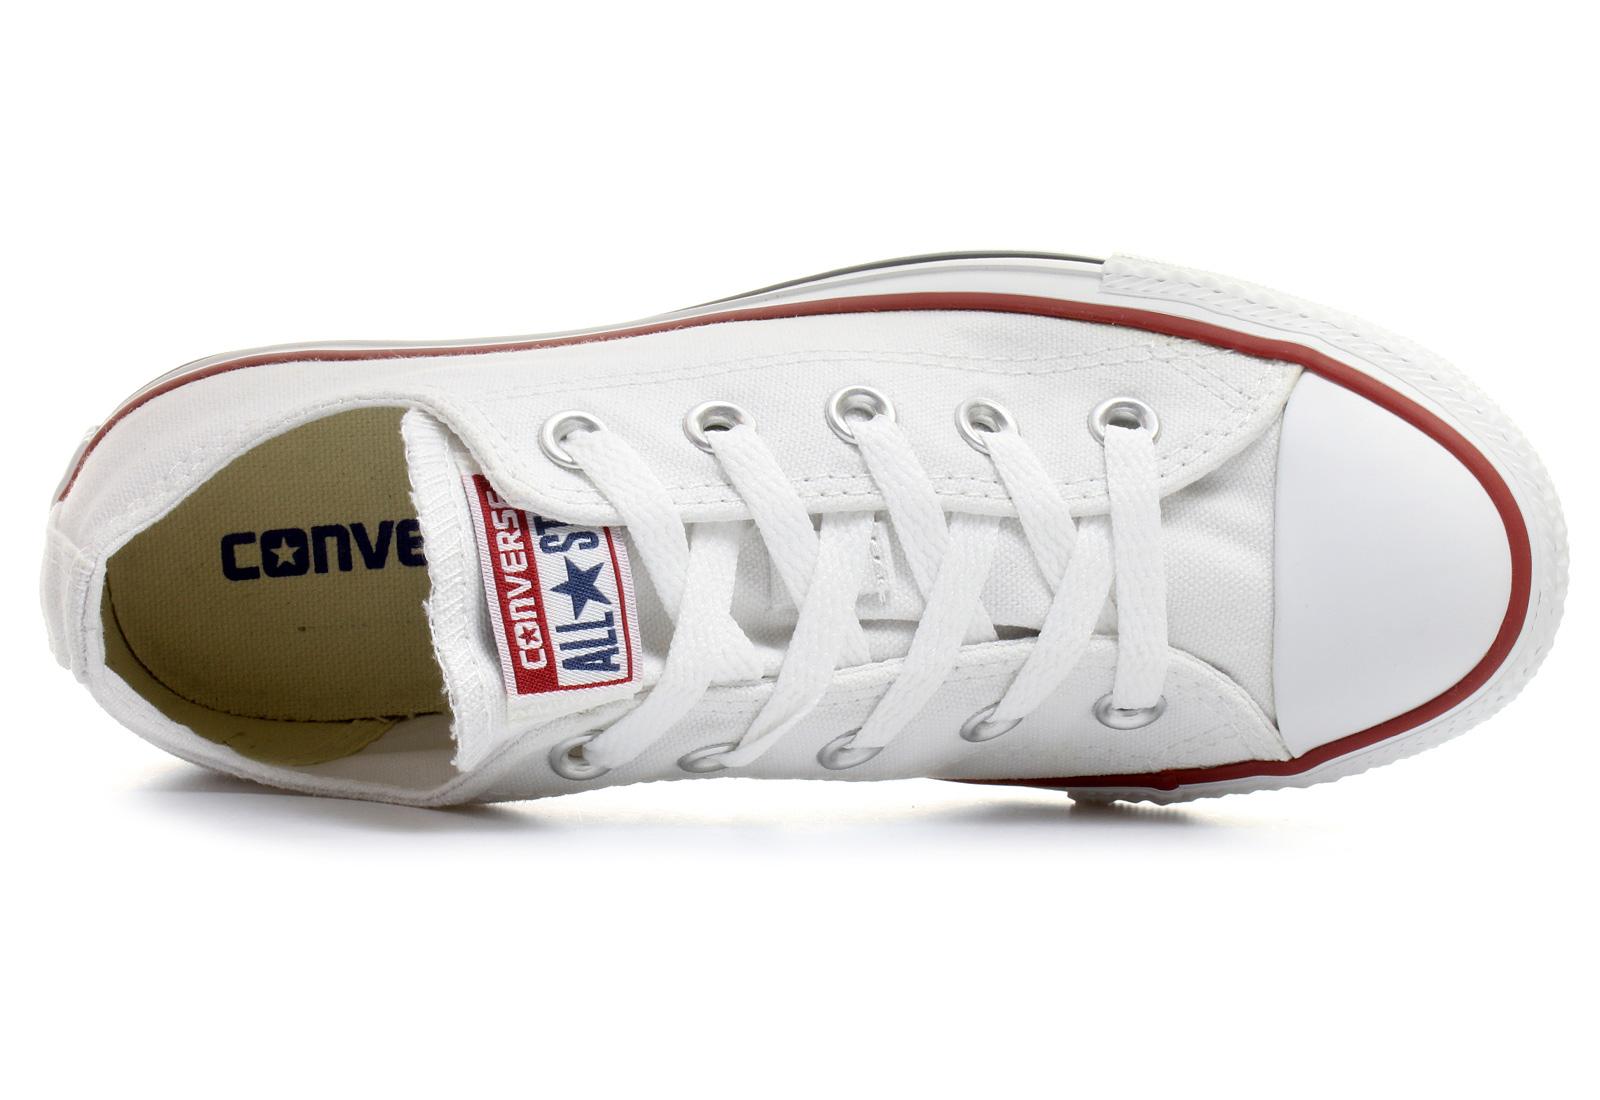 Converse Tornacipő - Ct As Core Ox - M7652C - Office Shoes Magyarország 2c084f3c4a